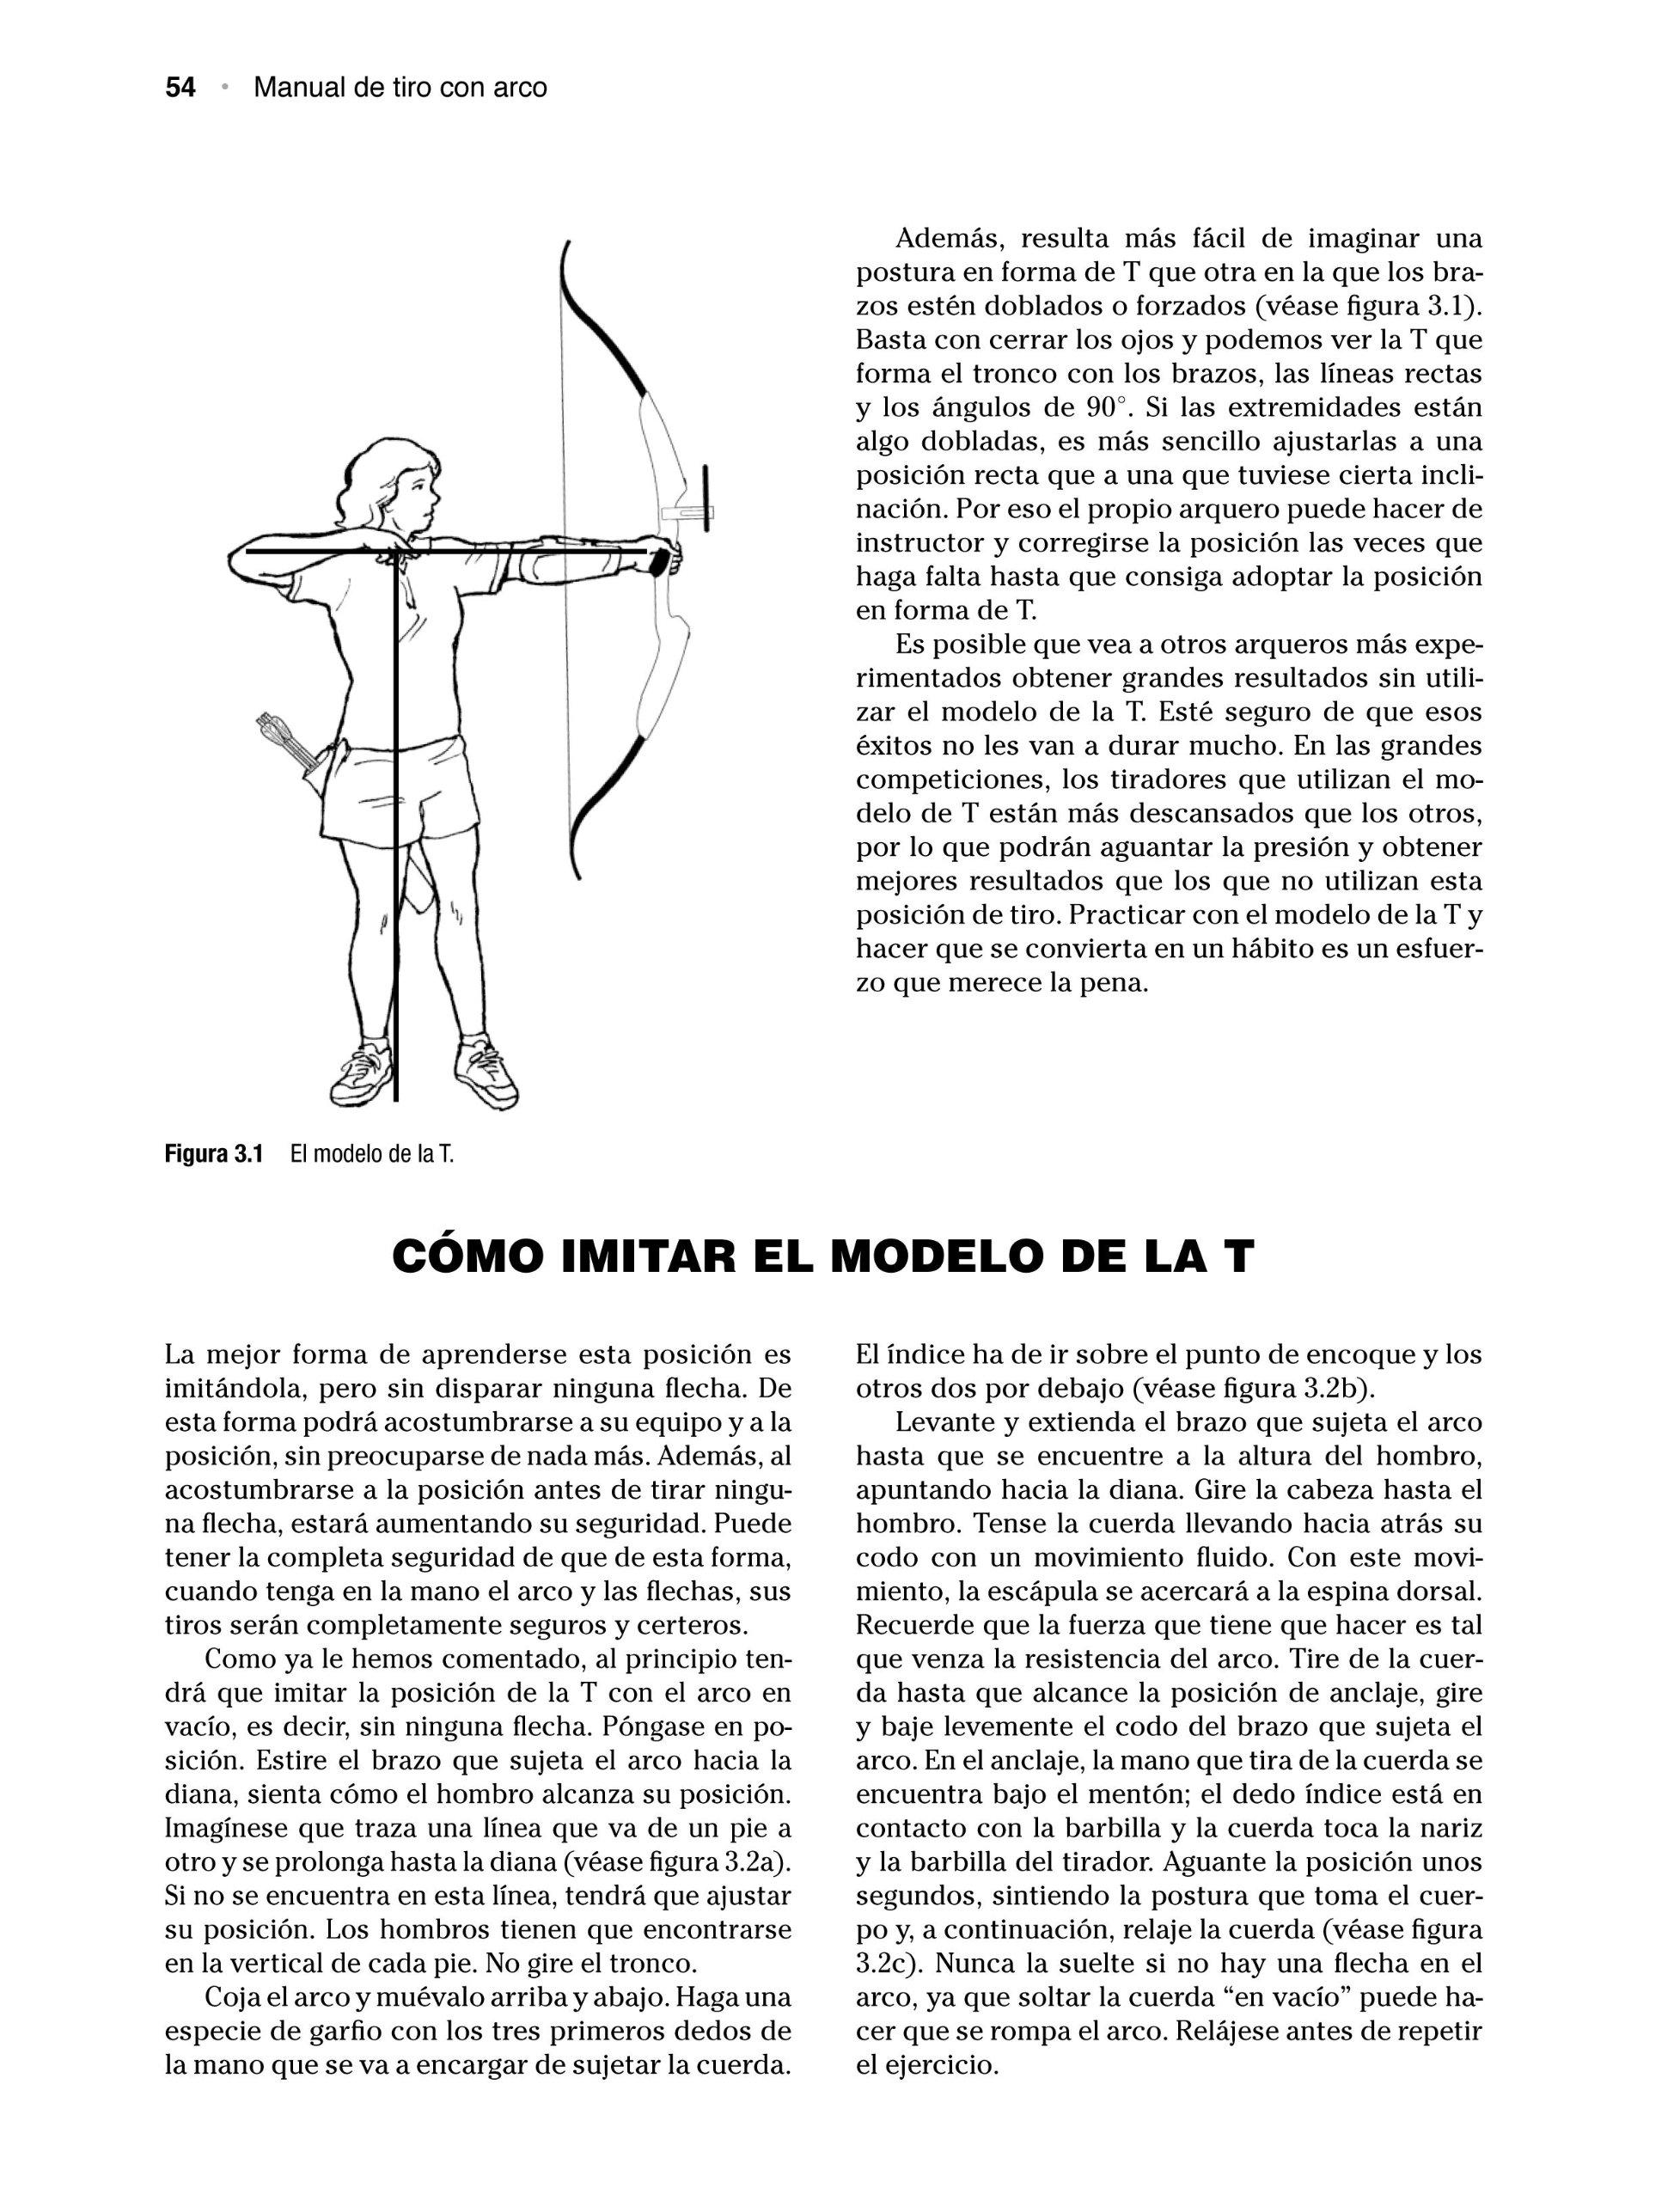 Manual De Tiro Con Arco. Ampliada Y Actualizada - 6ª Edición: Amazon ...